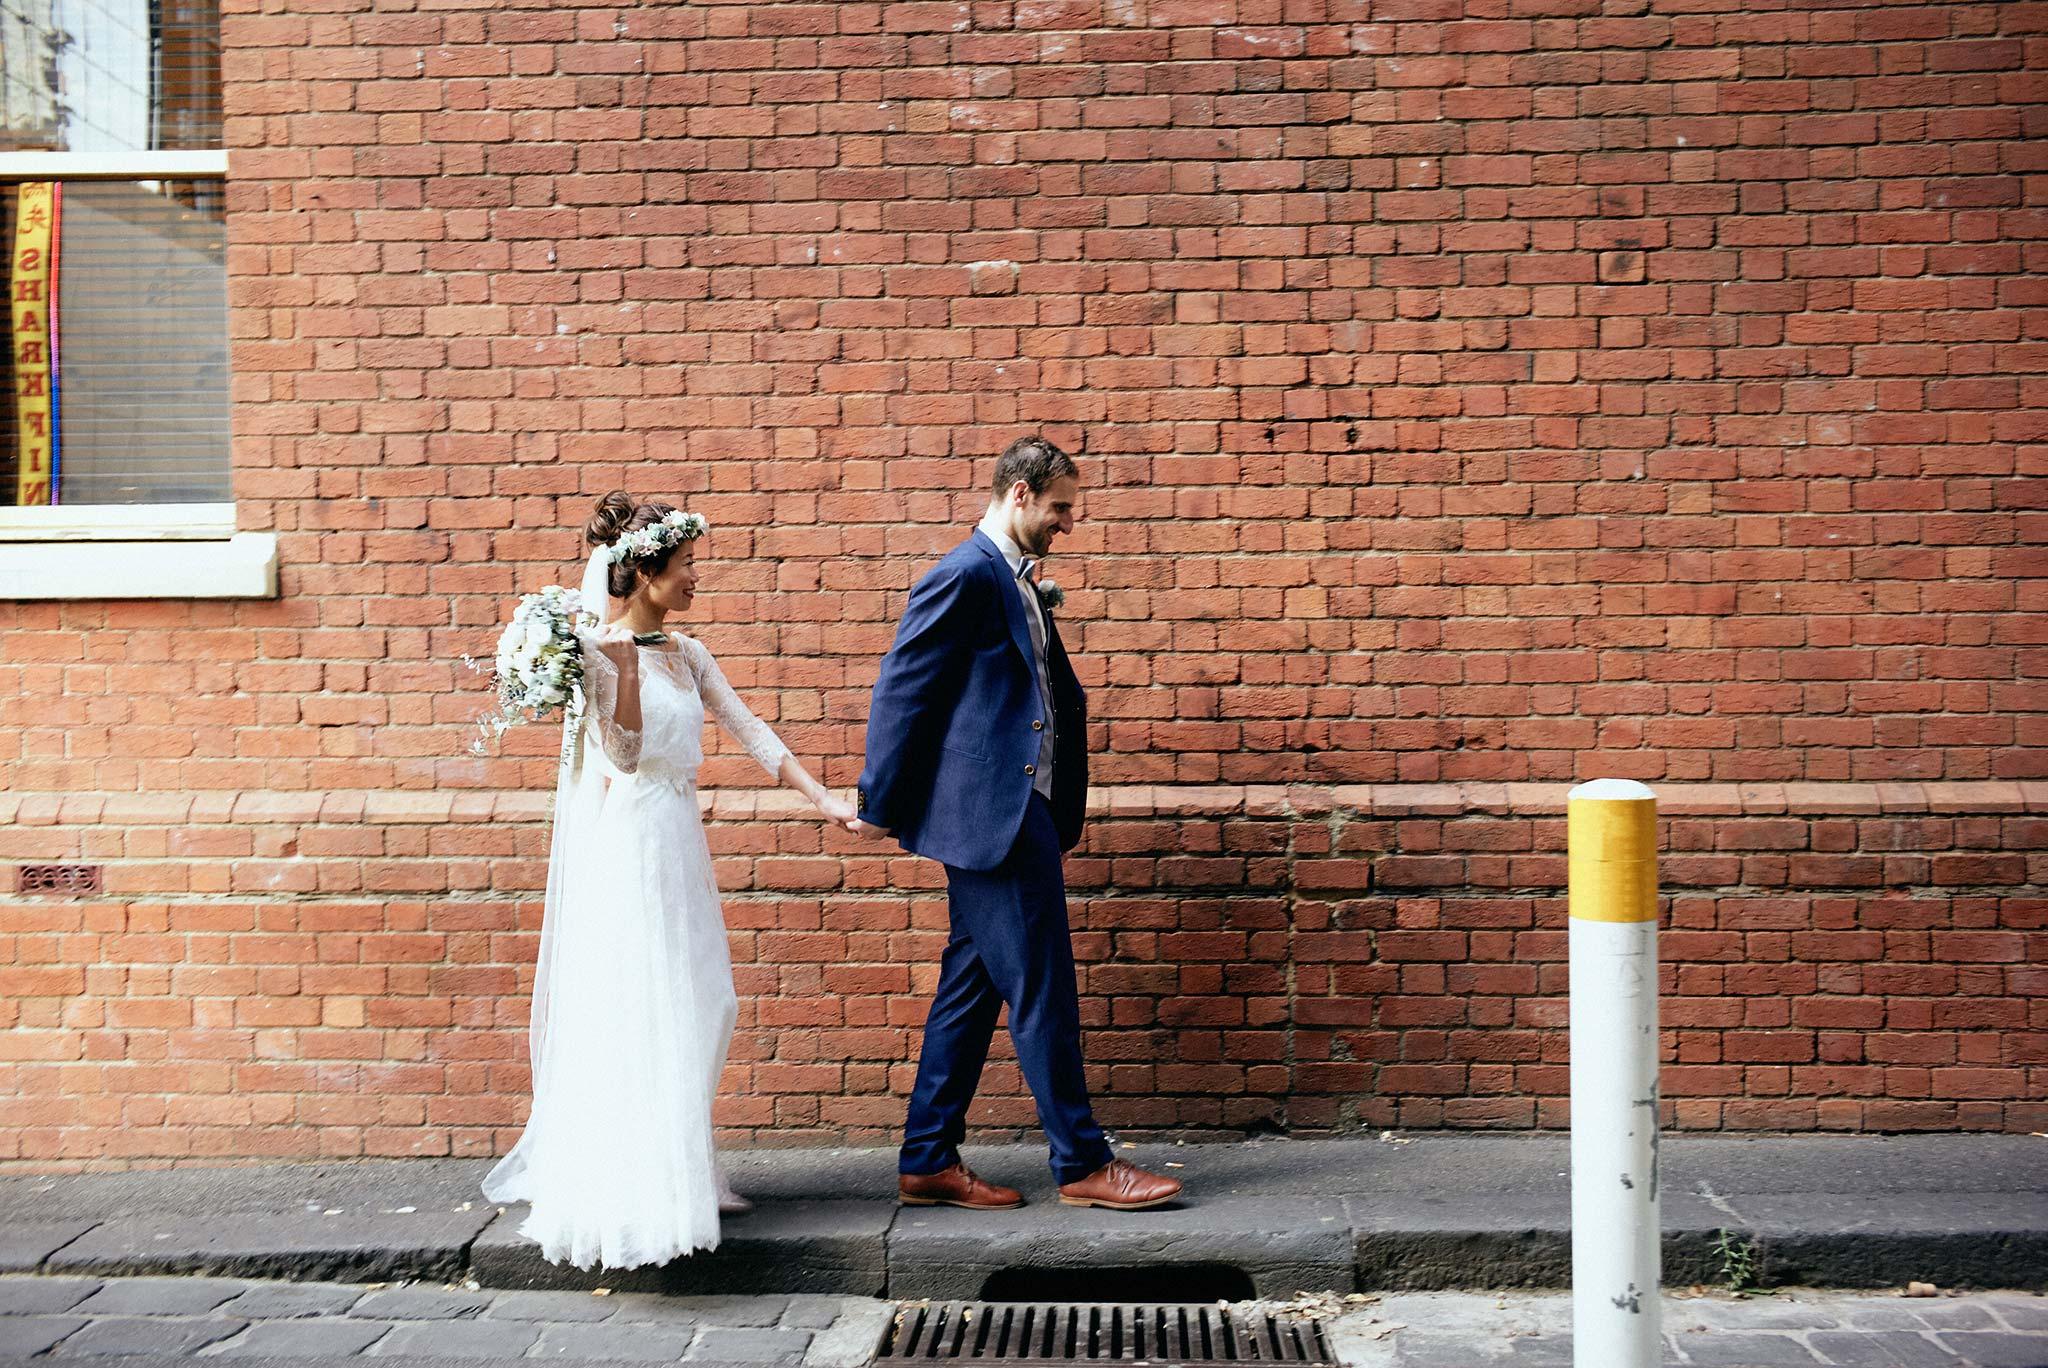 Melbourne-NGV-Triennial-Wedding-Laneway